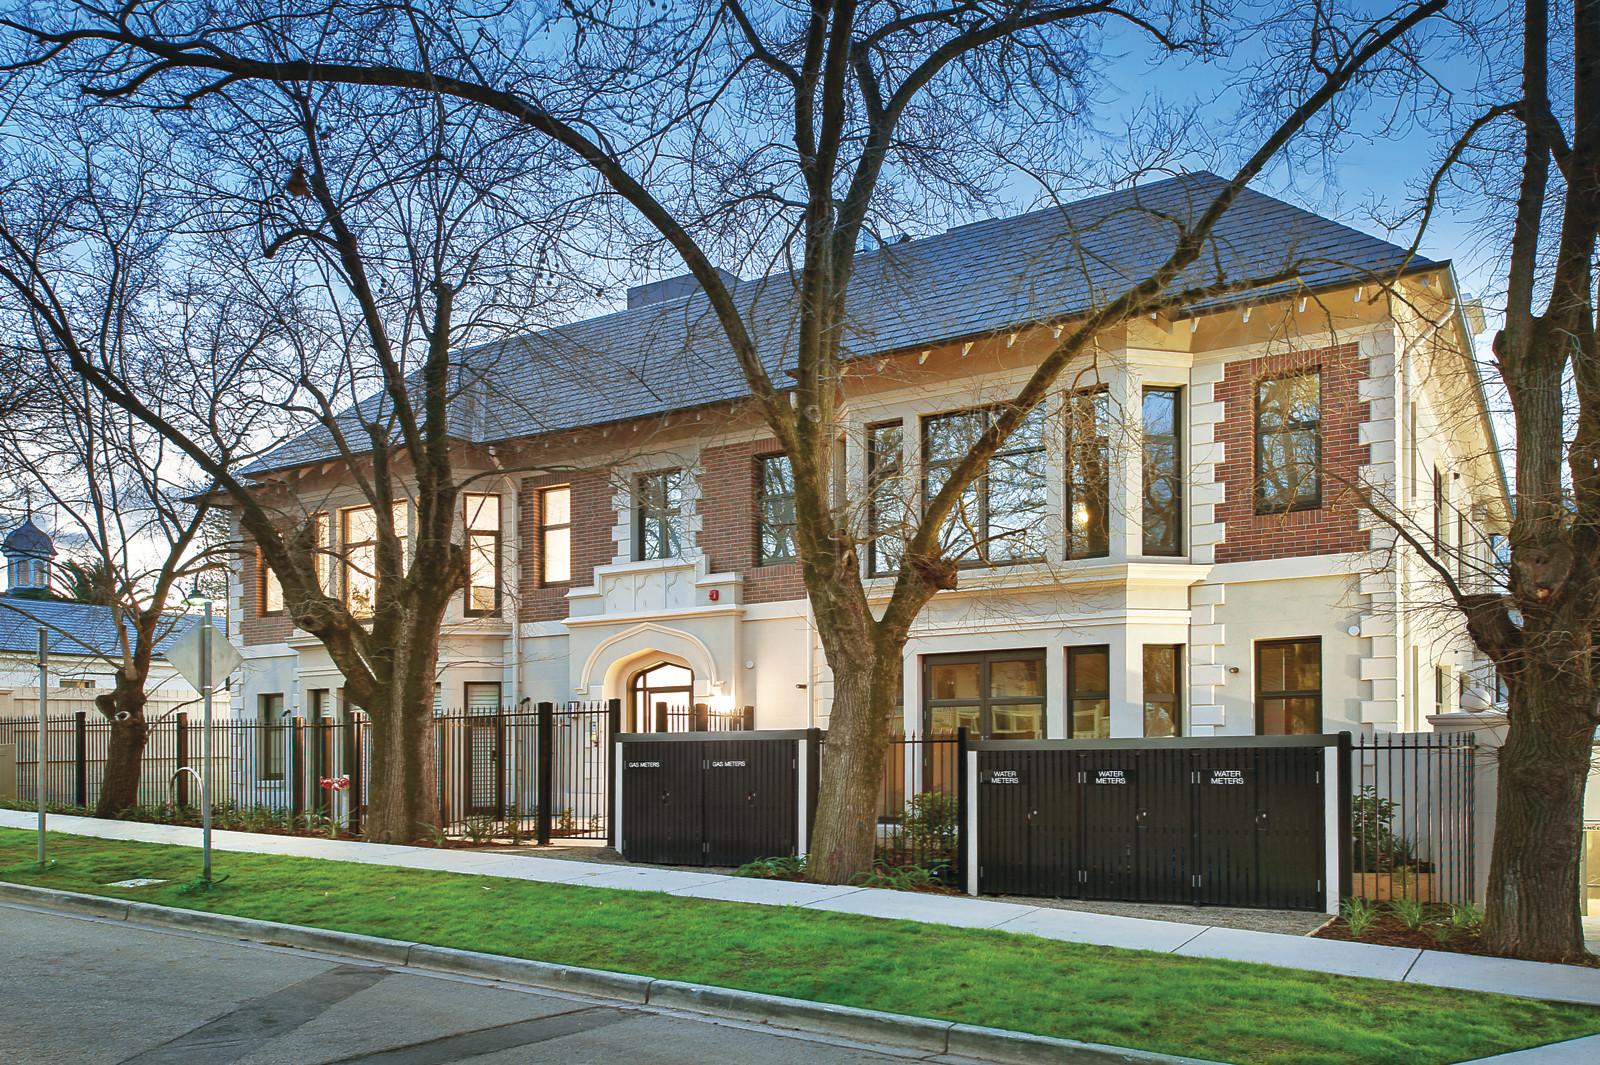 3/101 9 Somers Avenue, Malvern VIC 3144, Image 0